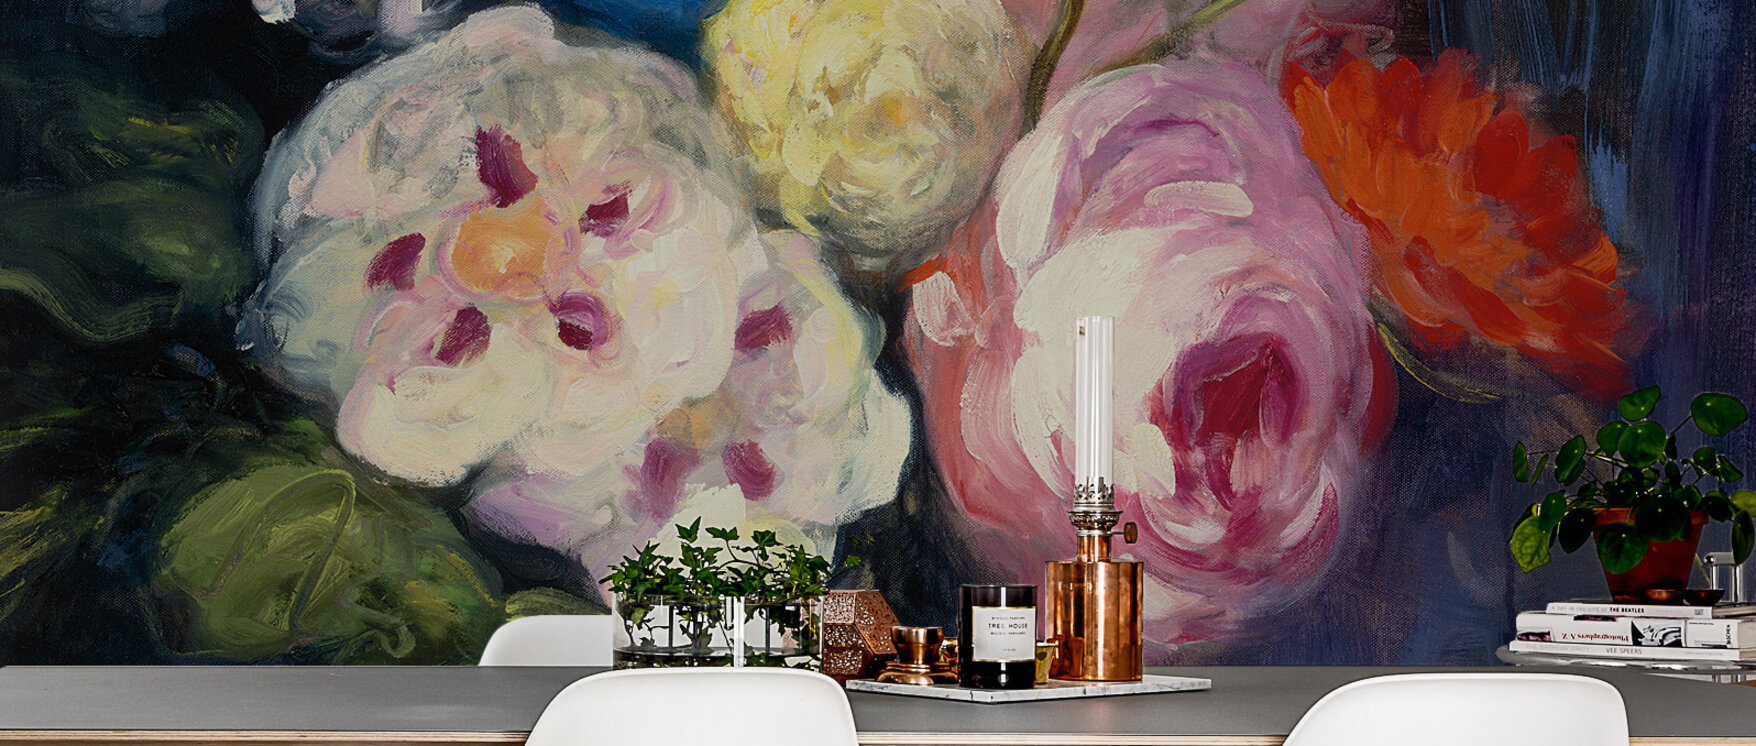 fresh cut fototapete nach ma photowall. Black Bedroom Furniture Sets. Home Design Ideas